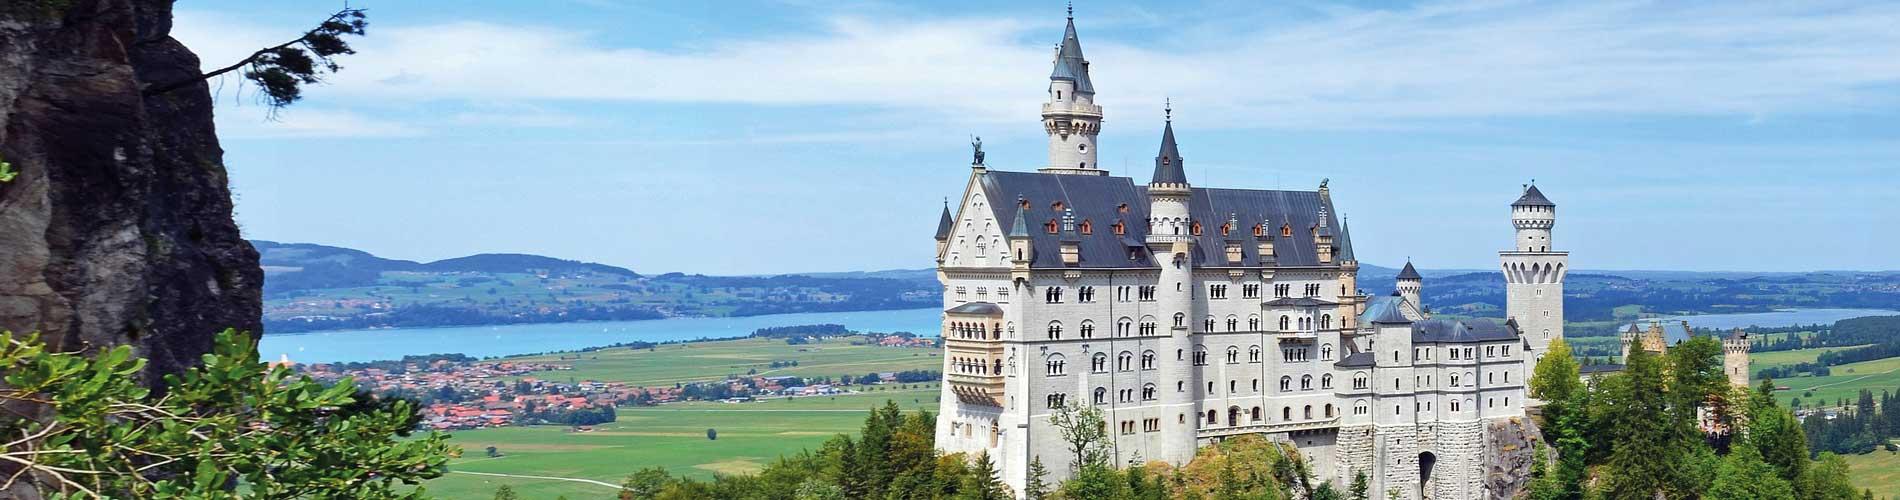 Blog_TopCastlesGermany_Neuschwanstein-Castle_1900x500